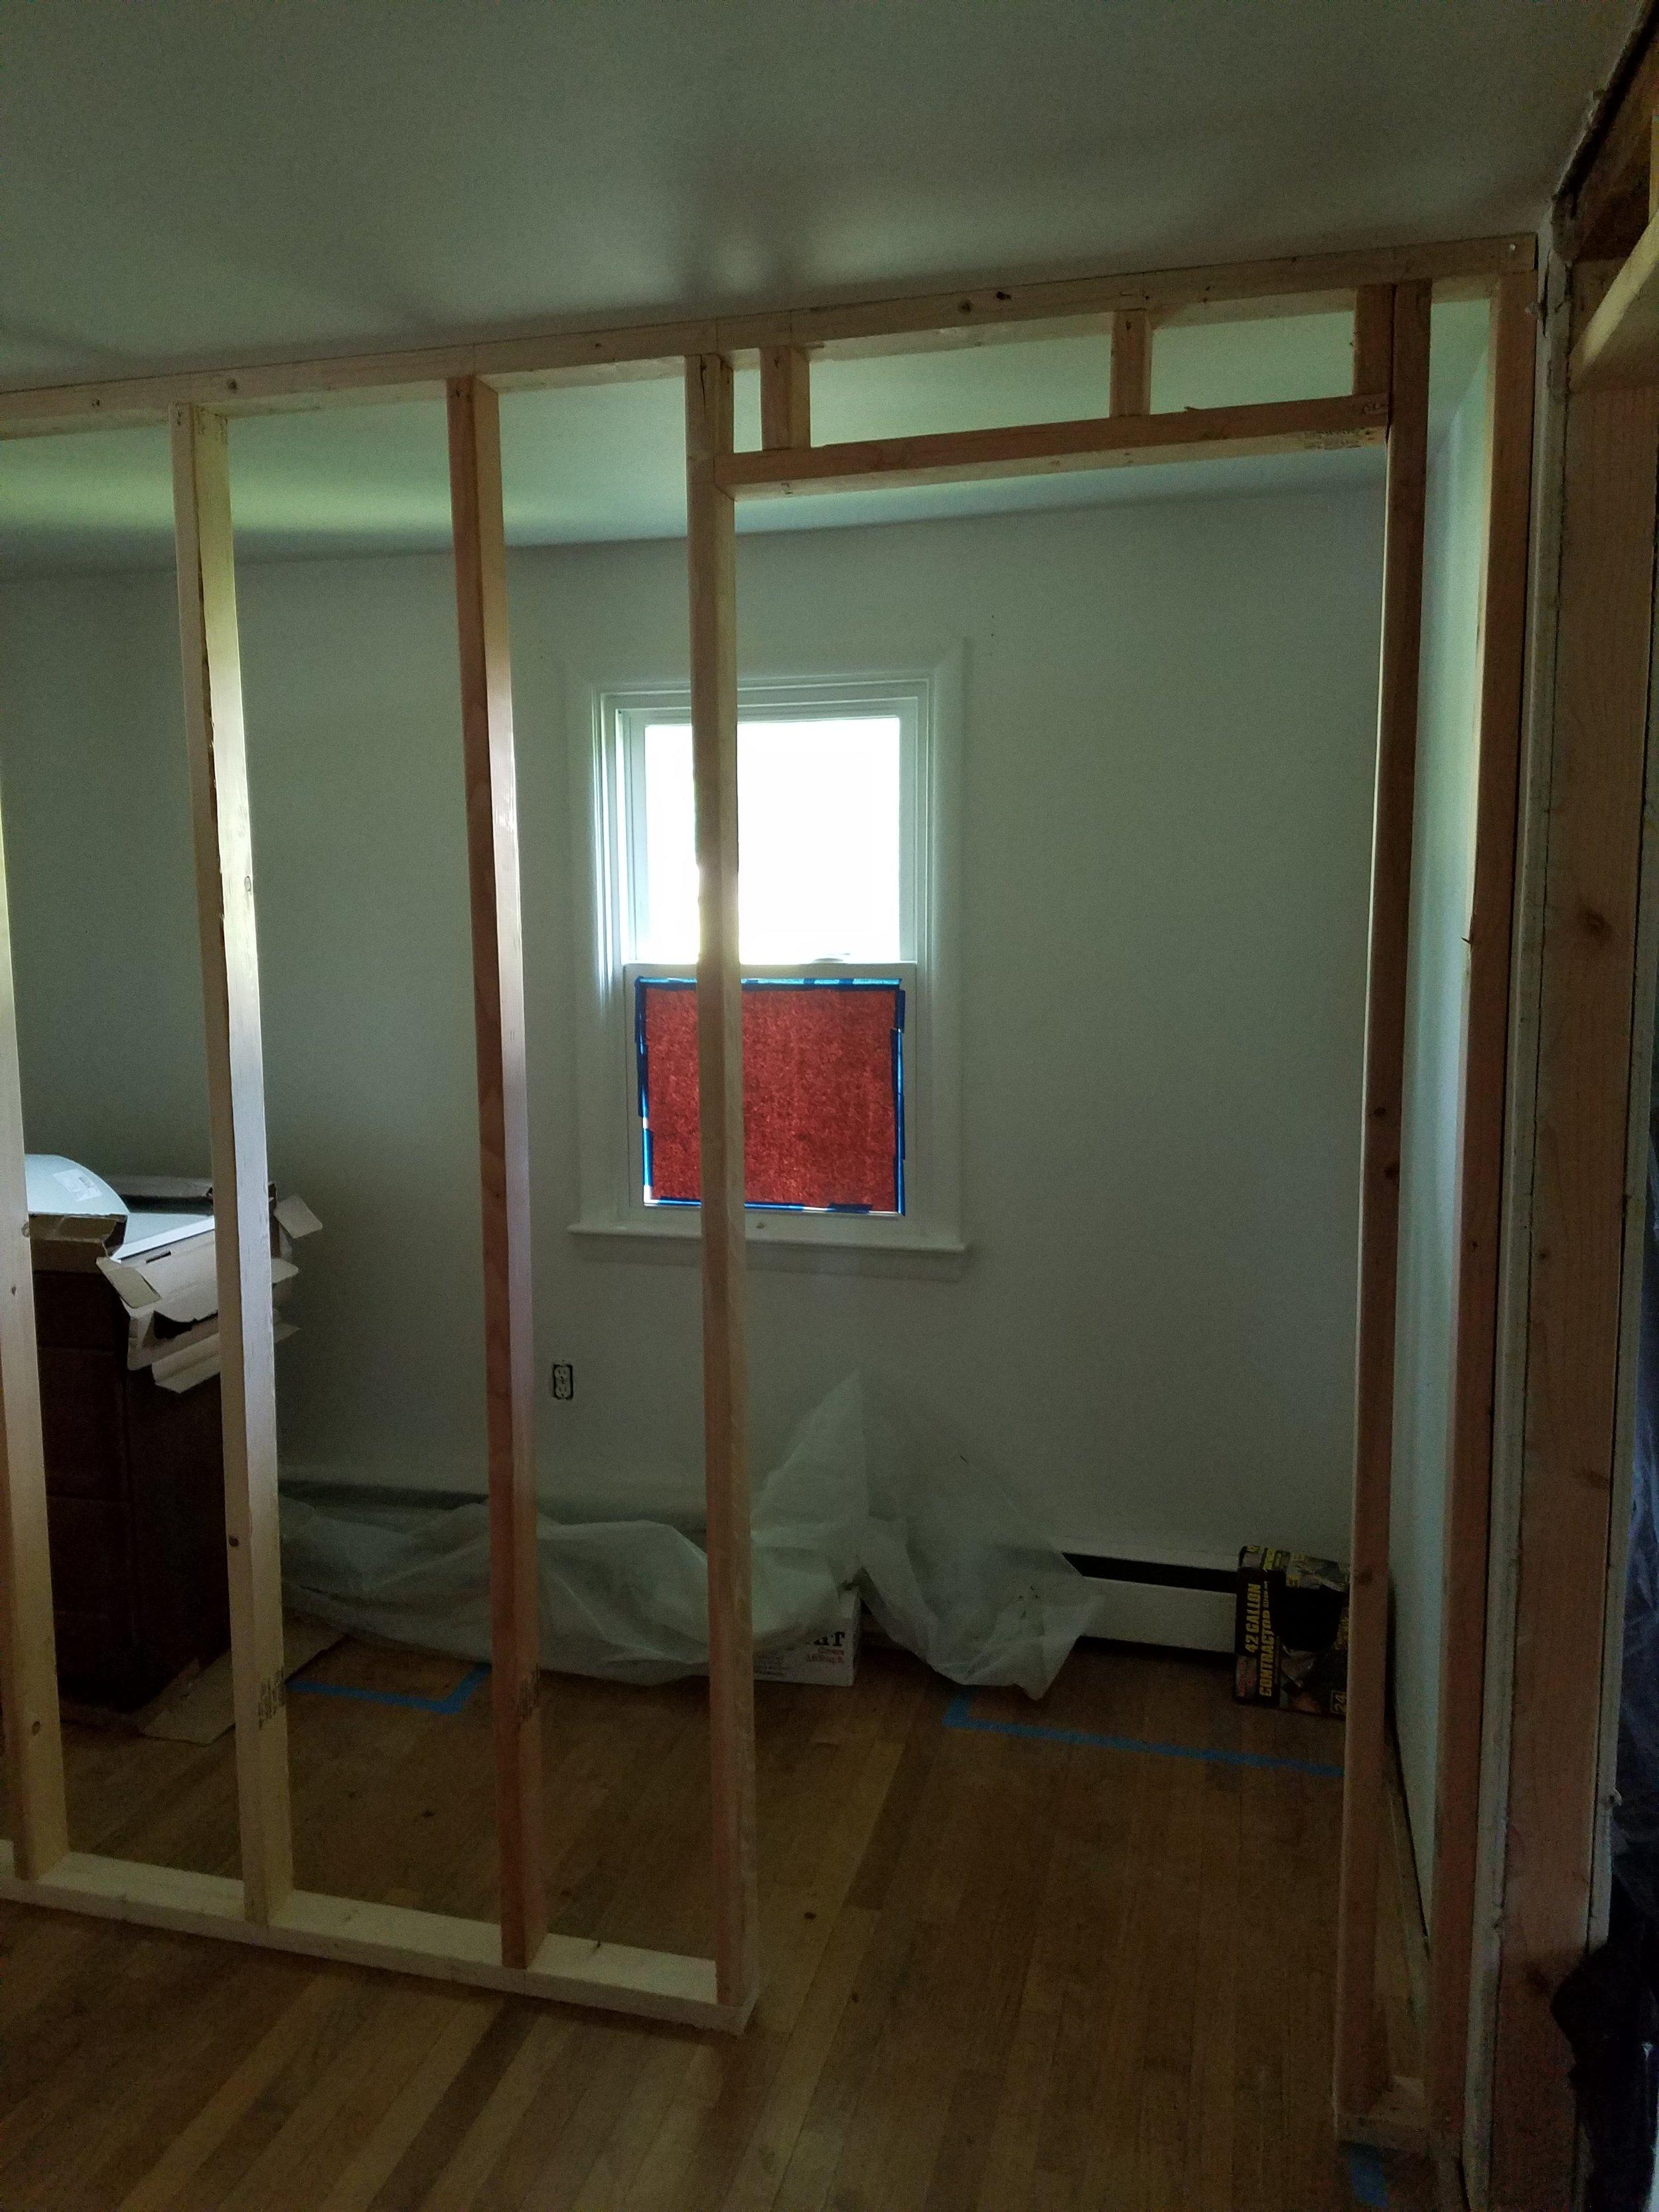 Harting closet.jpg